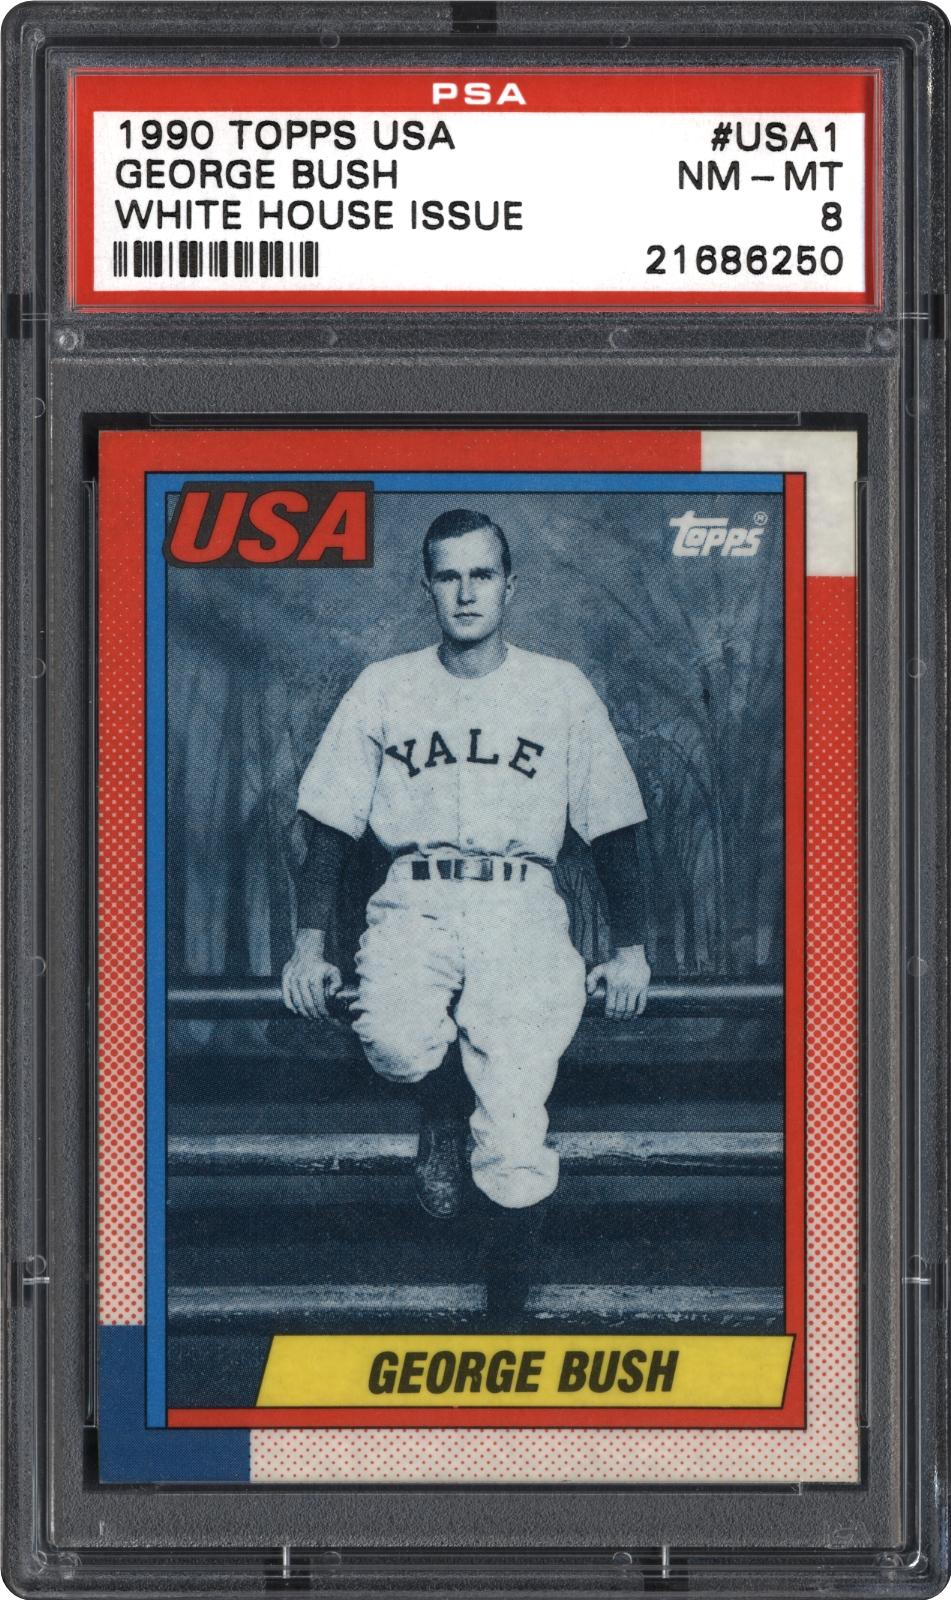 Baseball Cards 1990 Topps Usa Psa Cardfacts